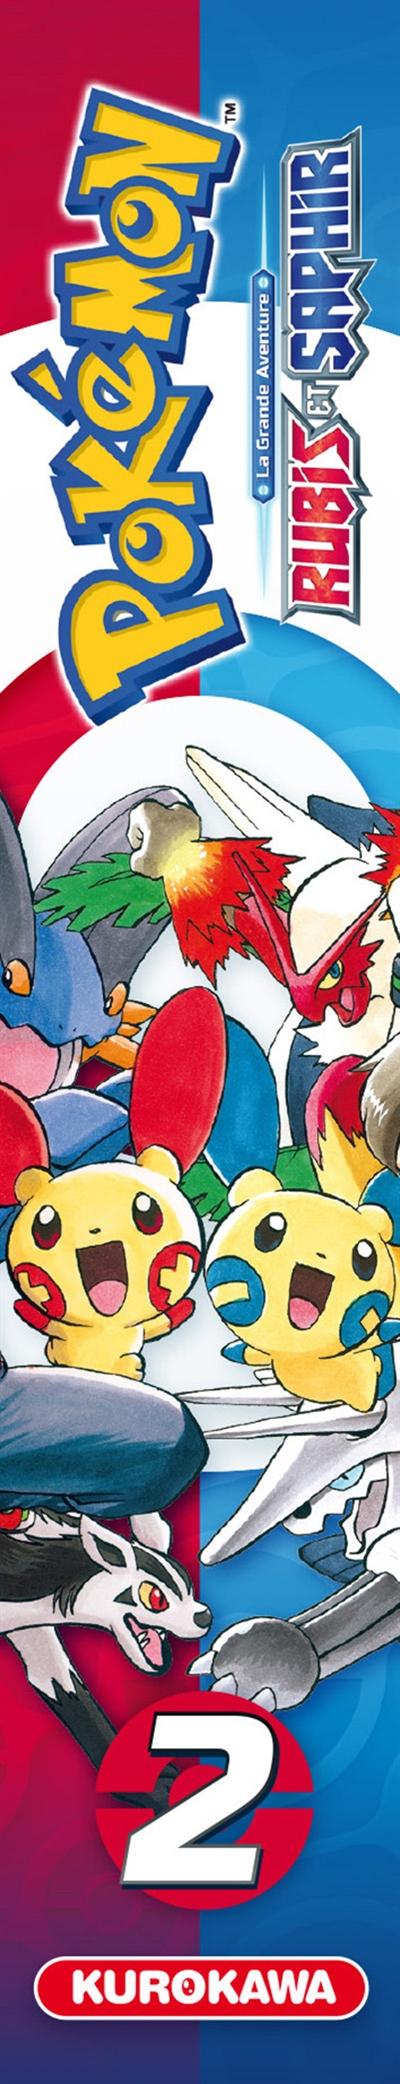 Pokémon : la grande aventure : Rubis et Saphir. 2 / scénario Hidenori Kusaka | Kusaka, Hidenori. Auteur